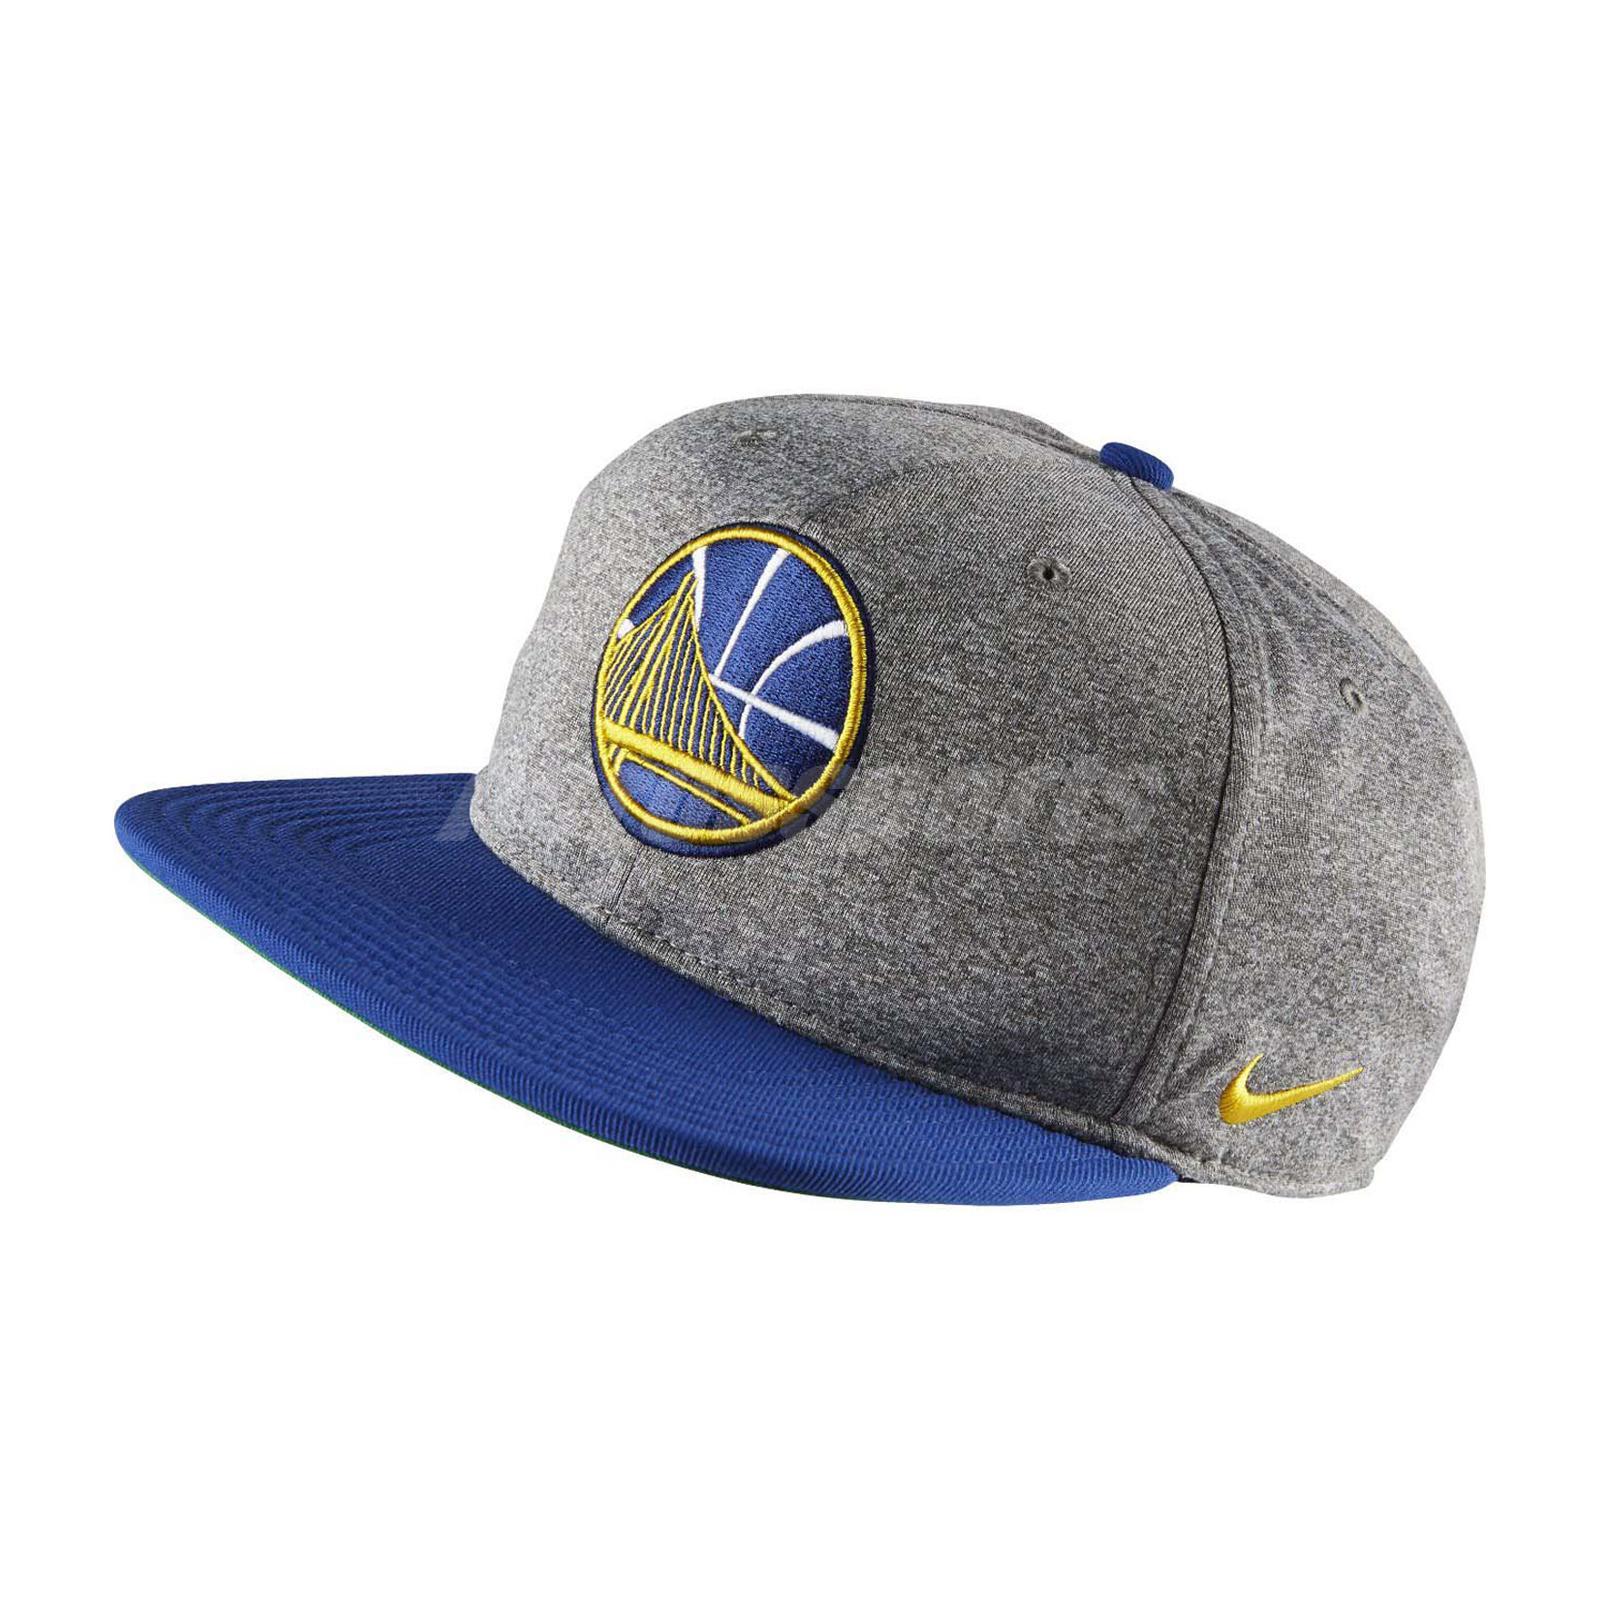 bcbda0cb23a Details about Nike Unisex Golden State Warriors Aerobill Pro Heather Cap  NBA GSW 869924-091